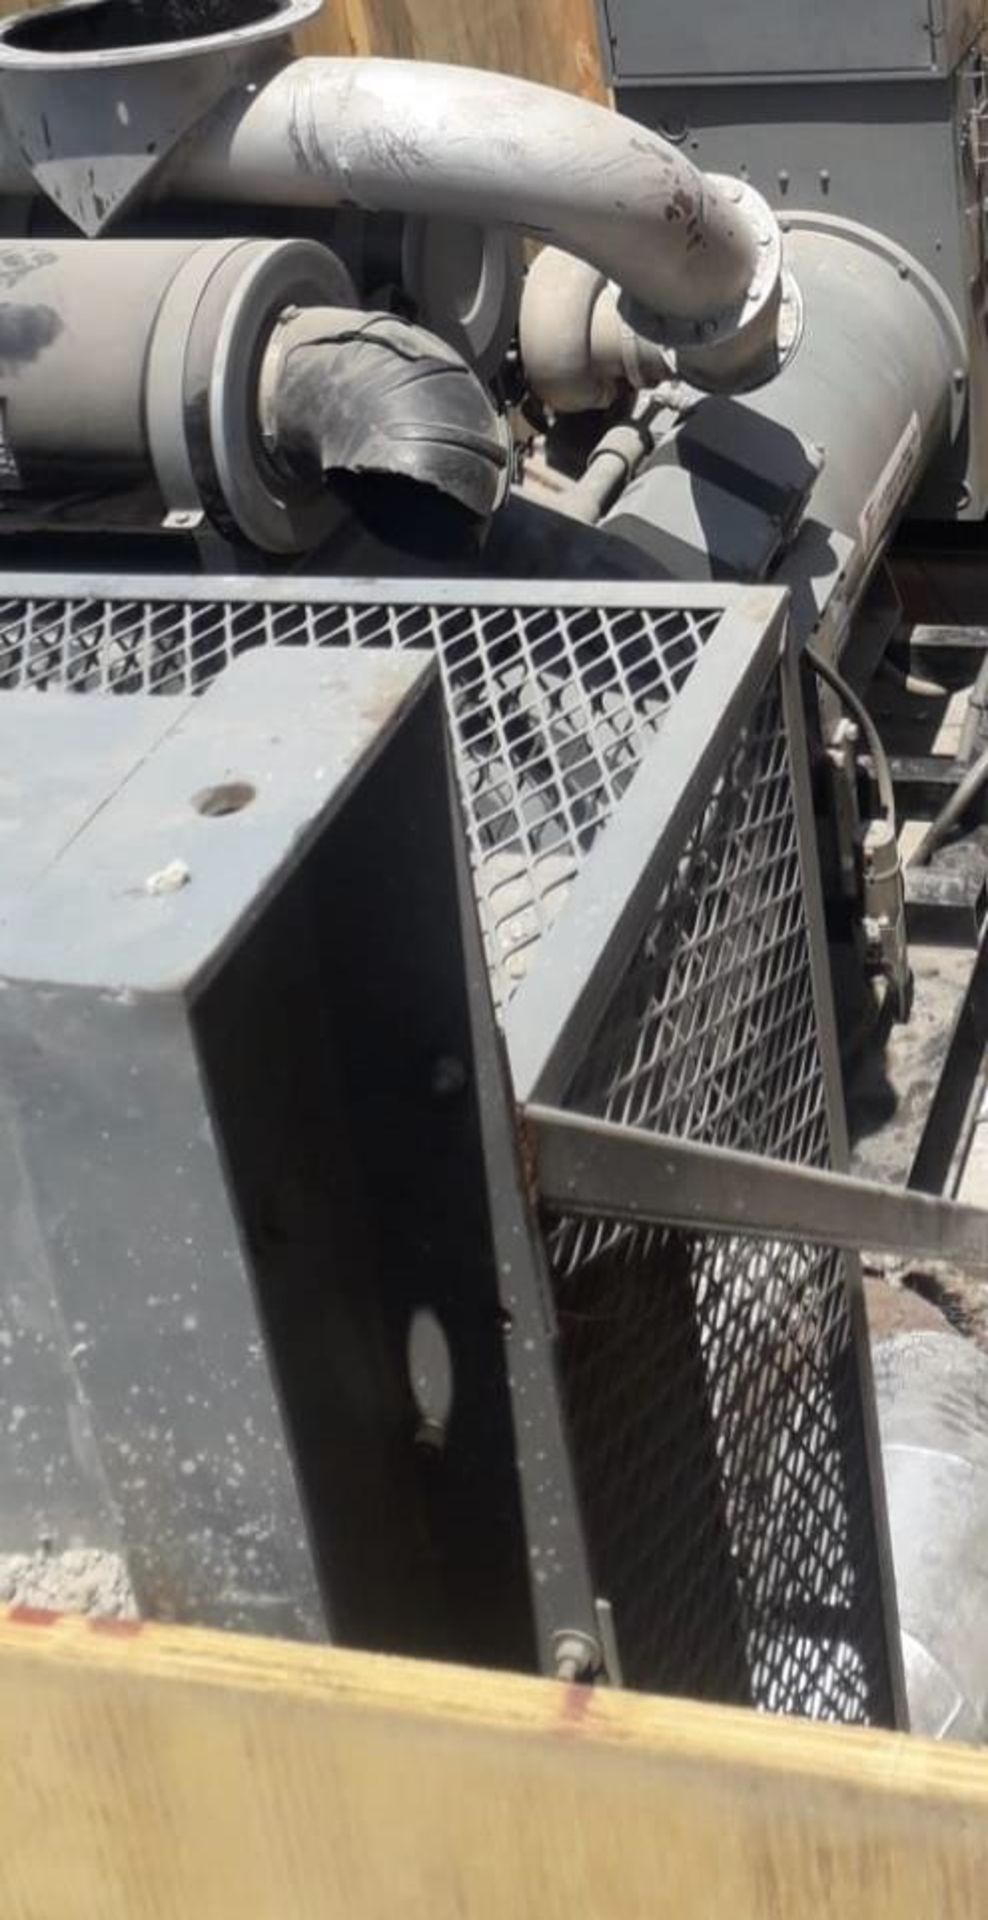 Ottomotores Emergency Plant capacity 1133 KW/1416 KVA, voltage 2020/440 - Image 4 of 4